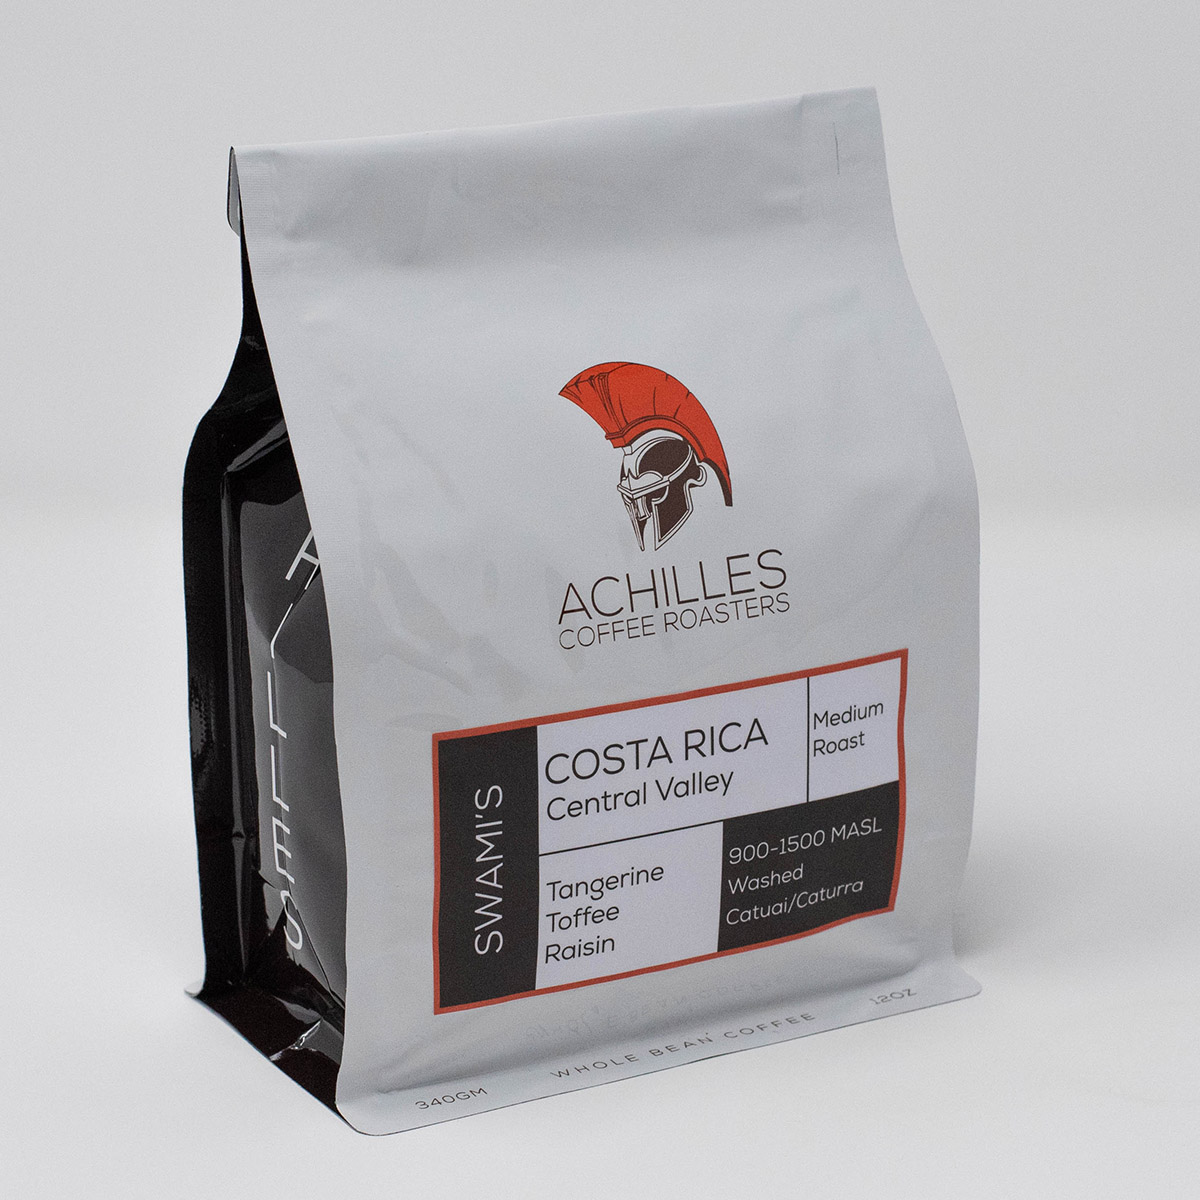 Whole Bean Coffee Medium Roast from Costa Rica